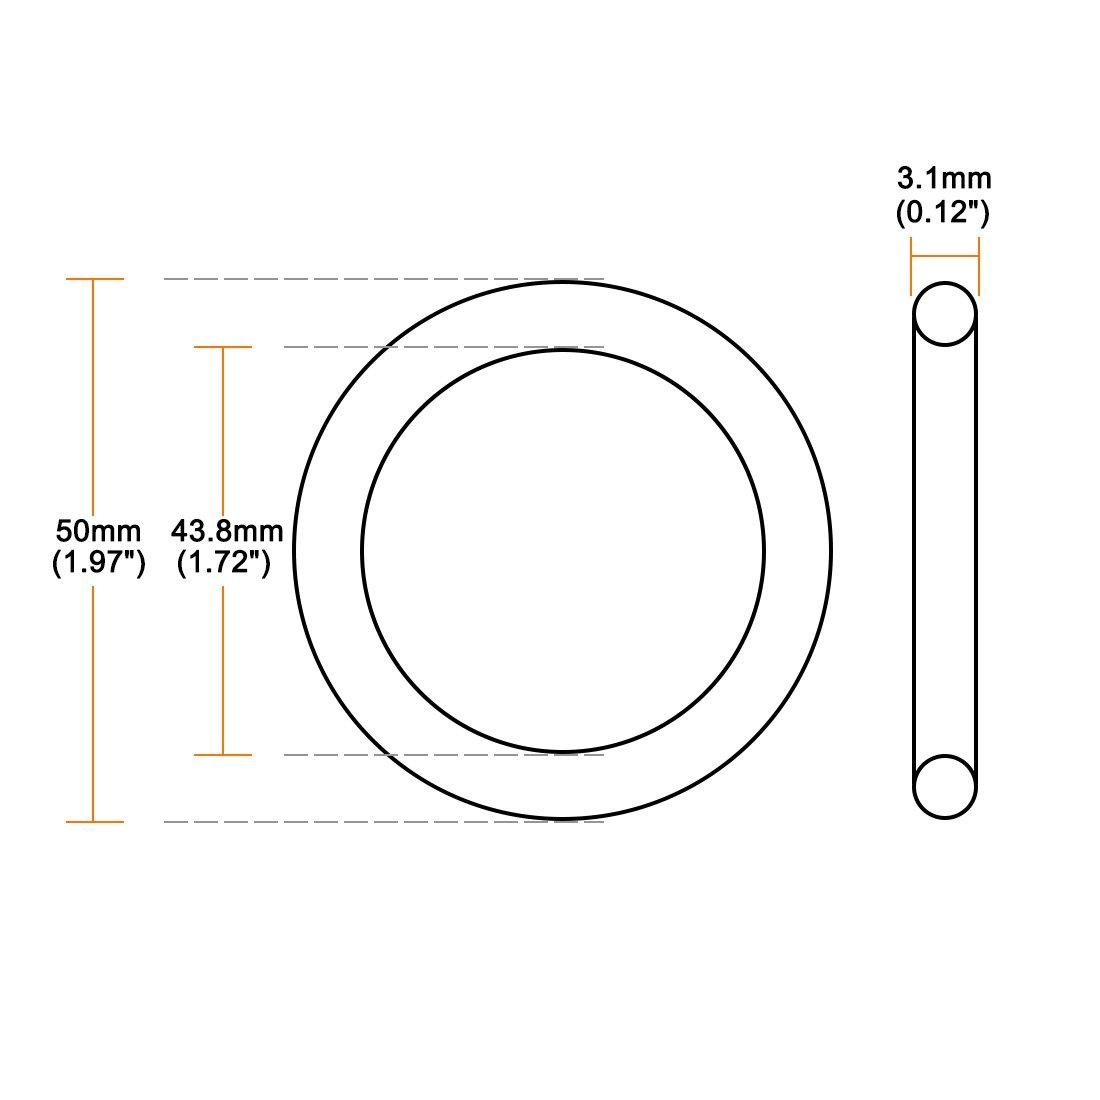 sourcing map 10 St/ück O-Ringe Nitrilkautschuk 58,8mm x 65mm x 3,1mm Dichtungsringe schwarz DE de